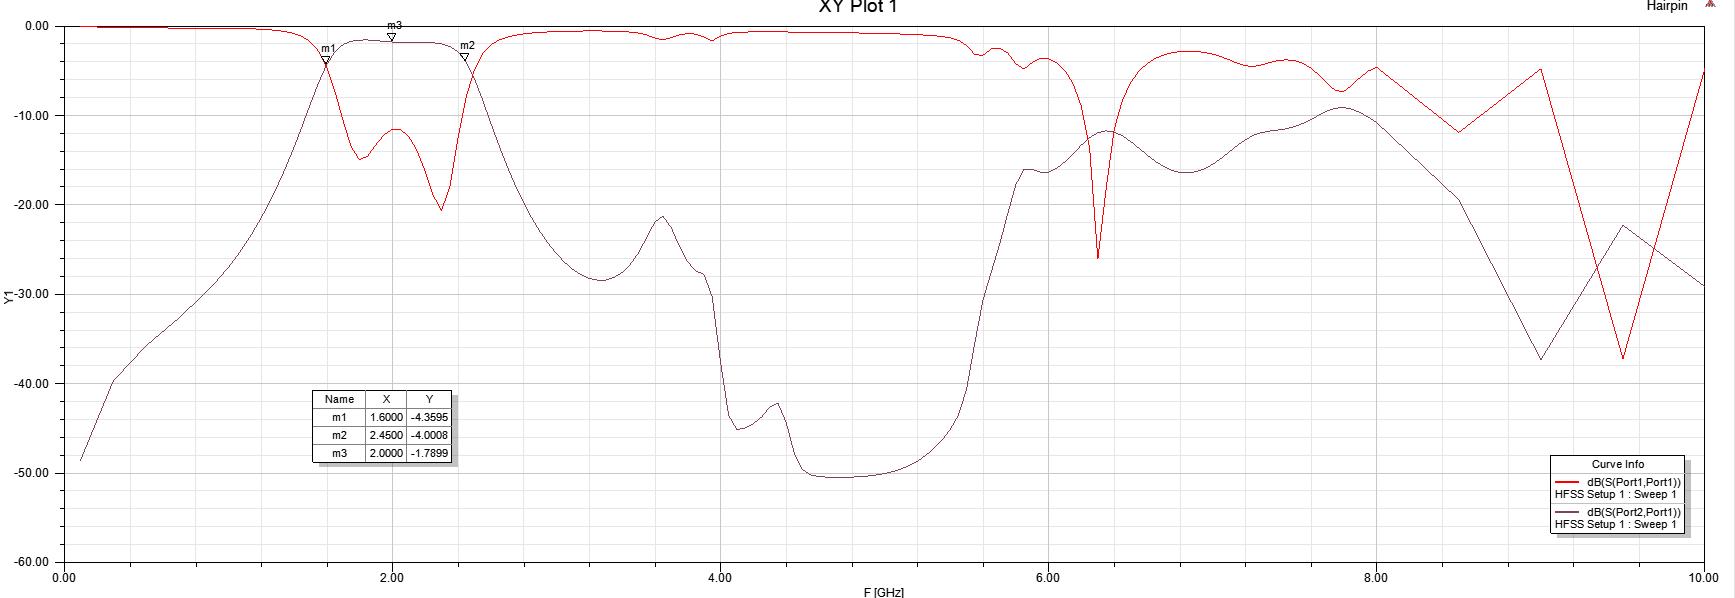 DSNRxR/LNA/hairpin_2GHz/V1/SIM_S21_S11.PNG